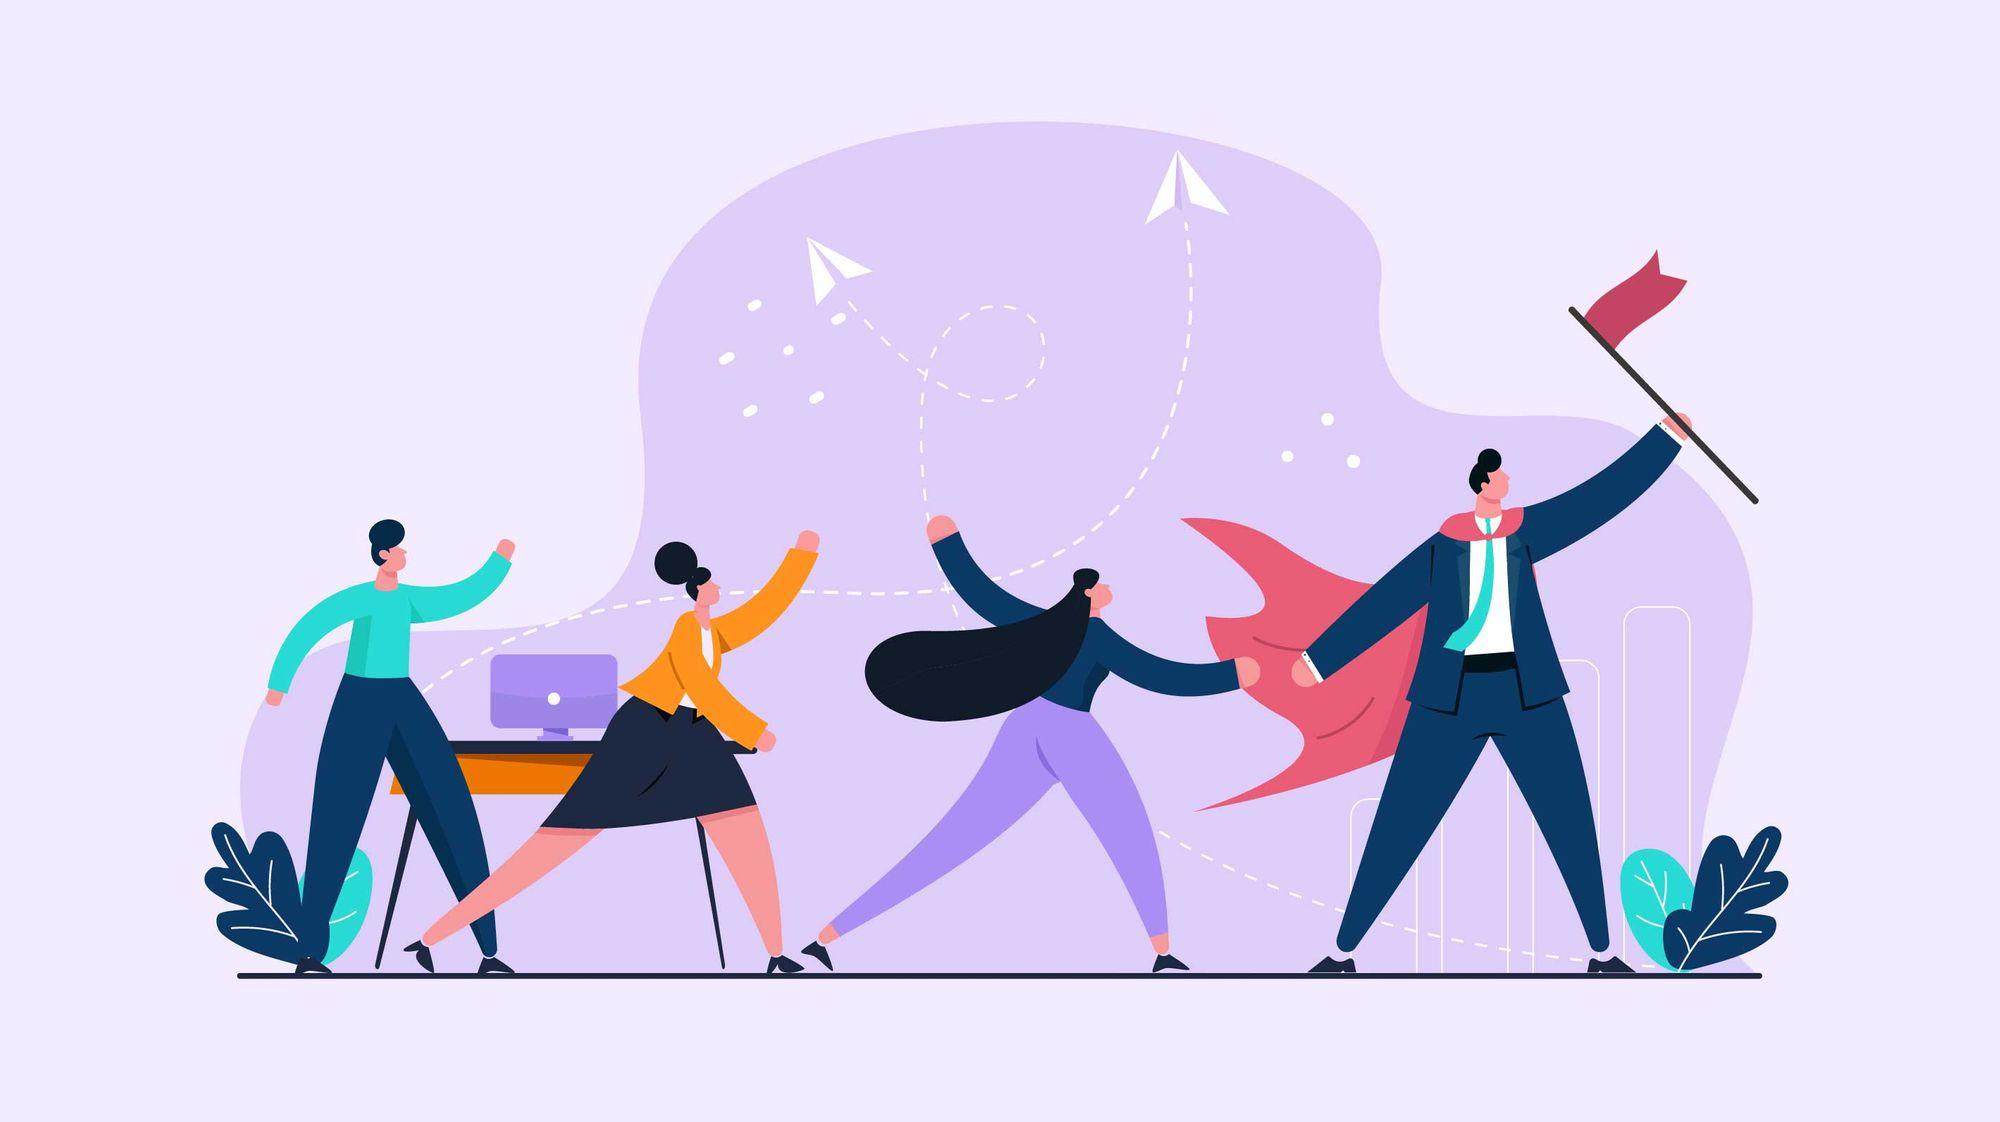 10 Winning Tips to Boost Team Motivation